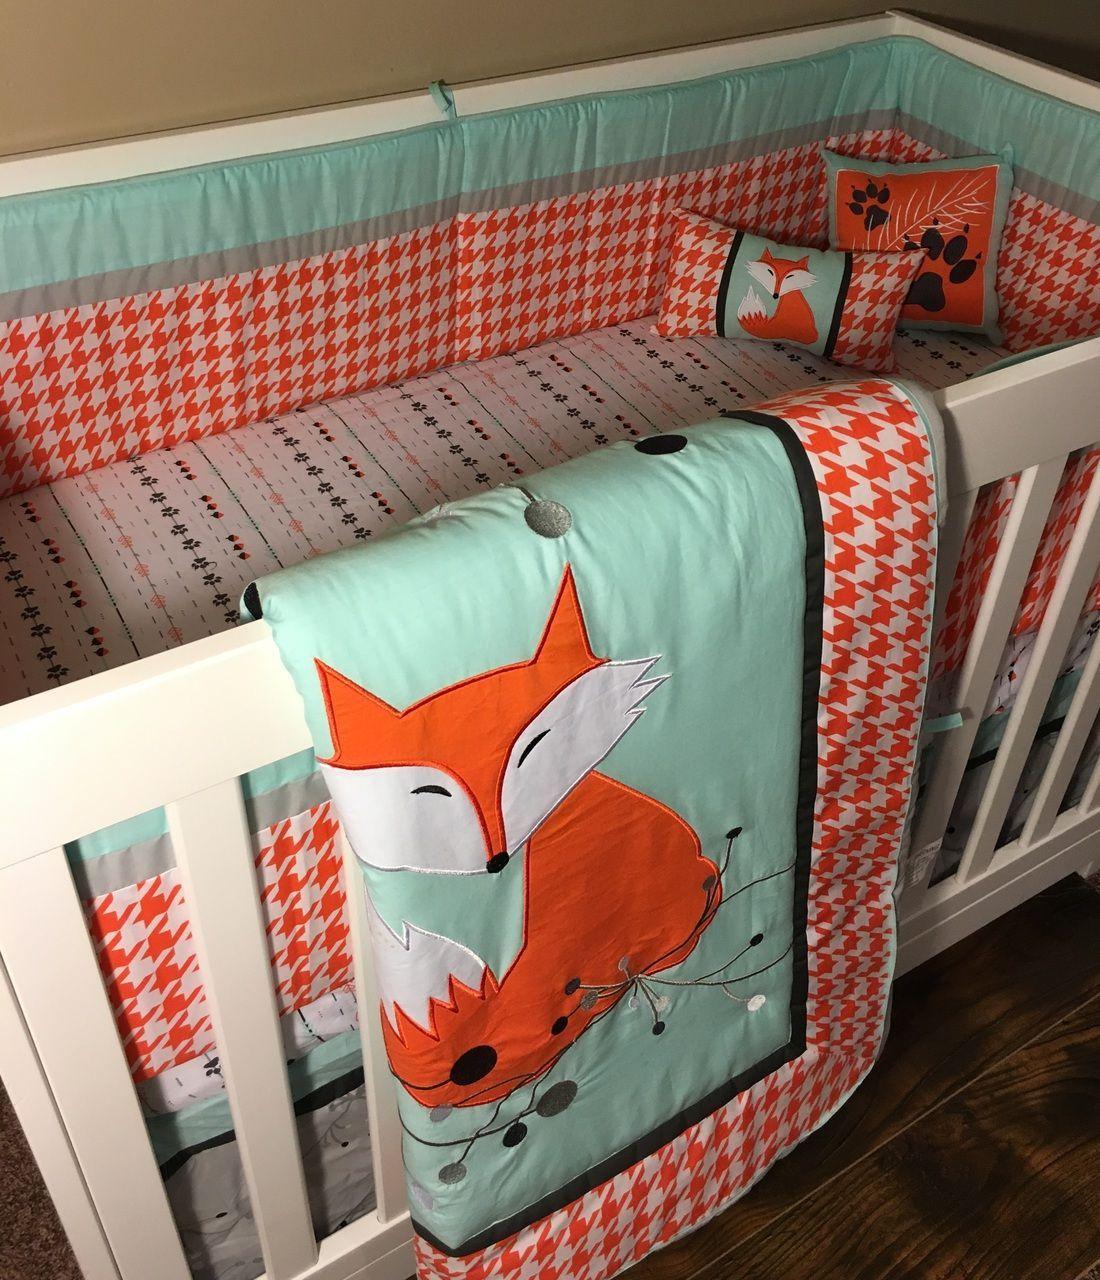 Dkl Designs Clever As A Fox Crib Bedding Set Crib Bedding Boy Fox Crib Bedding Crib Bedding Sets